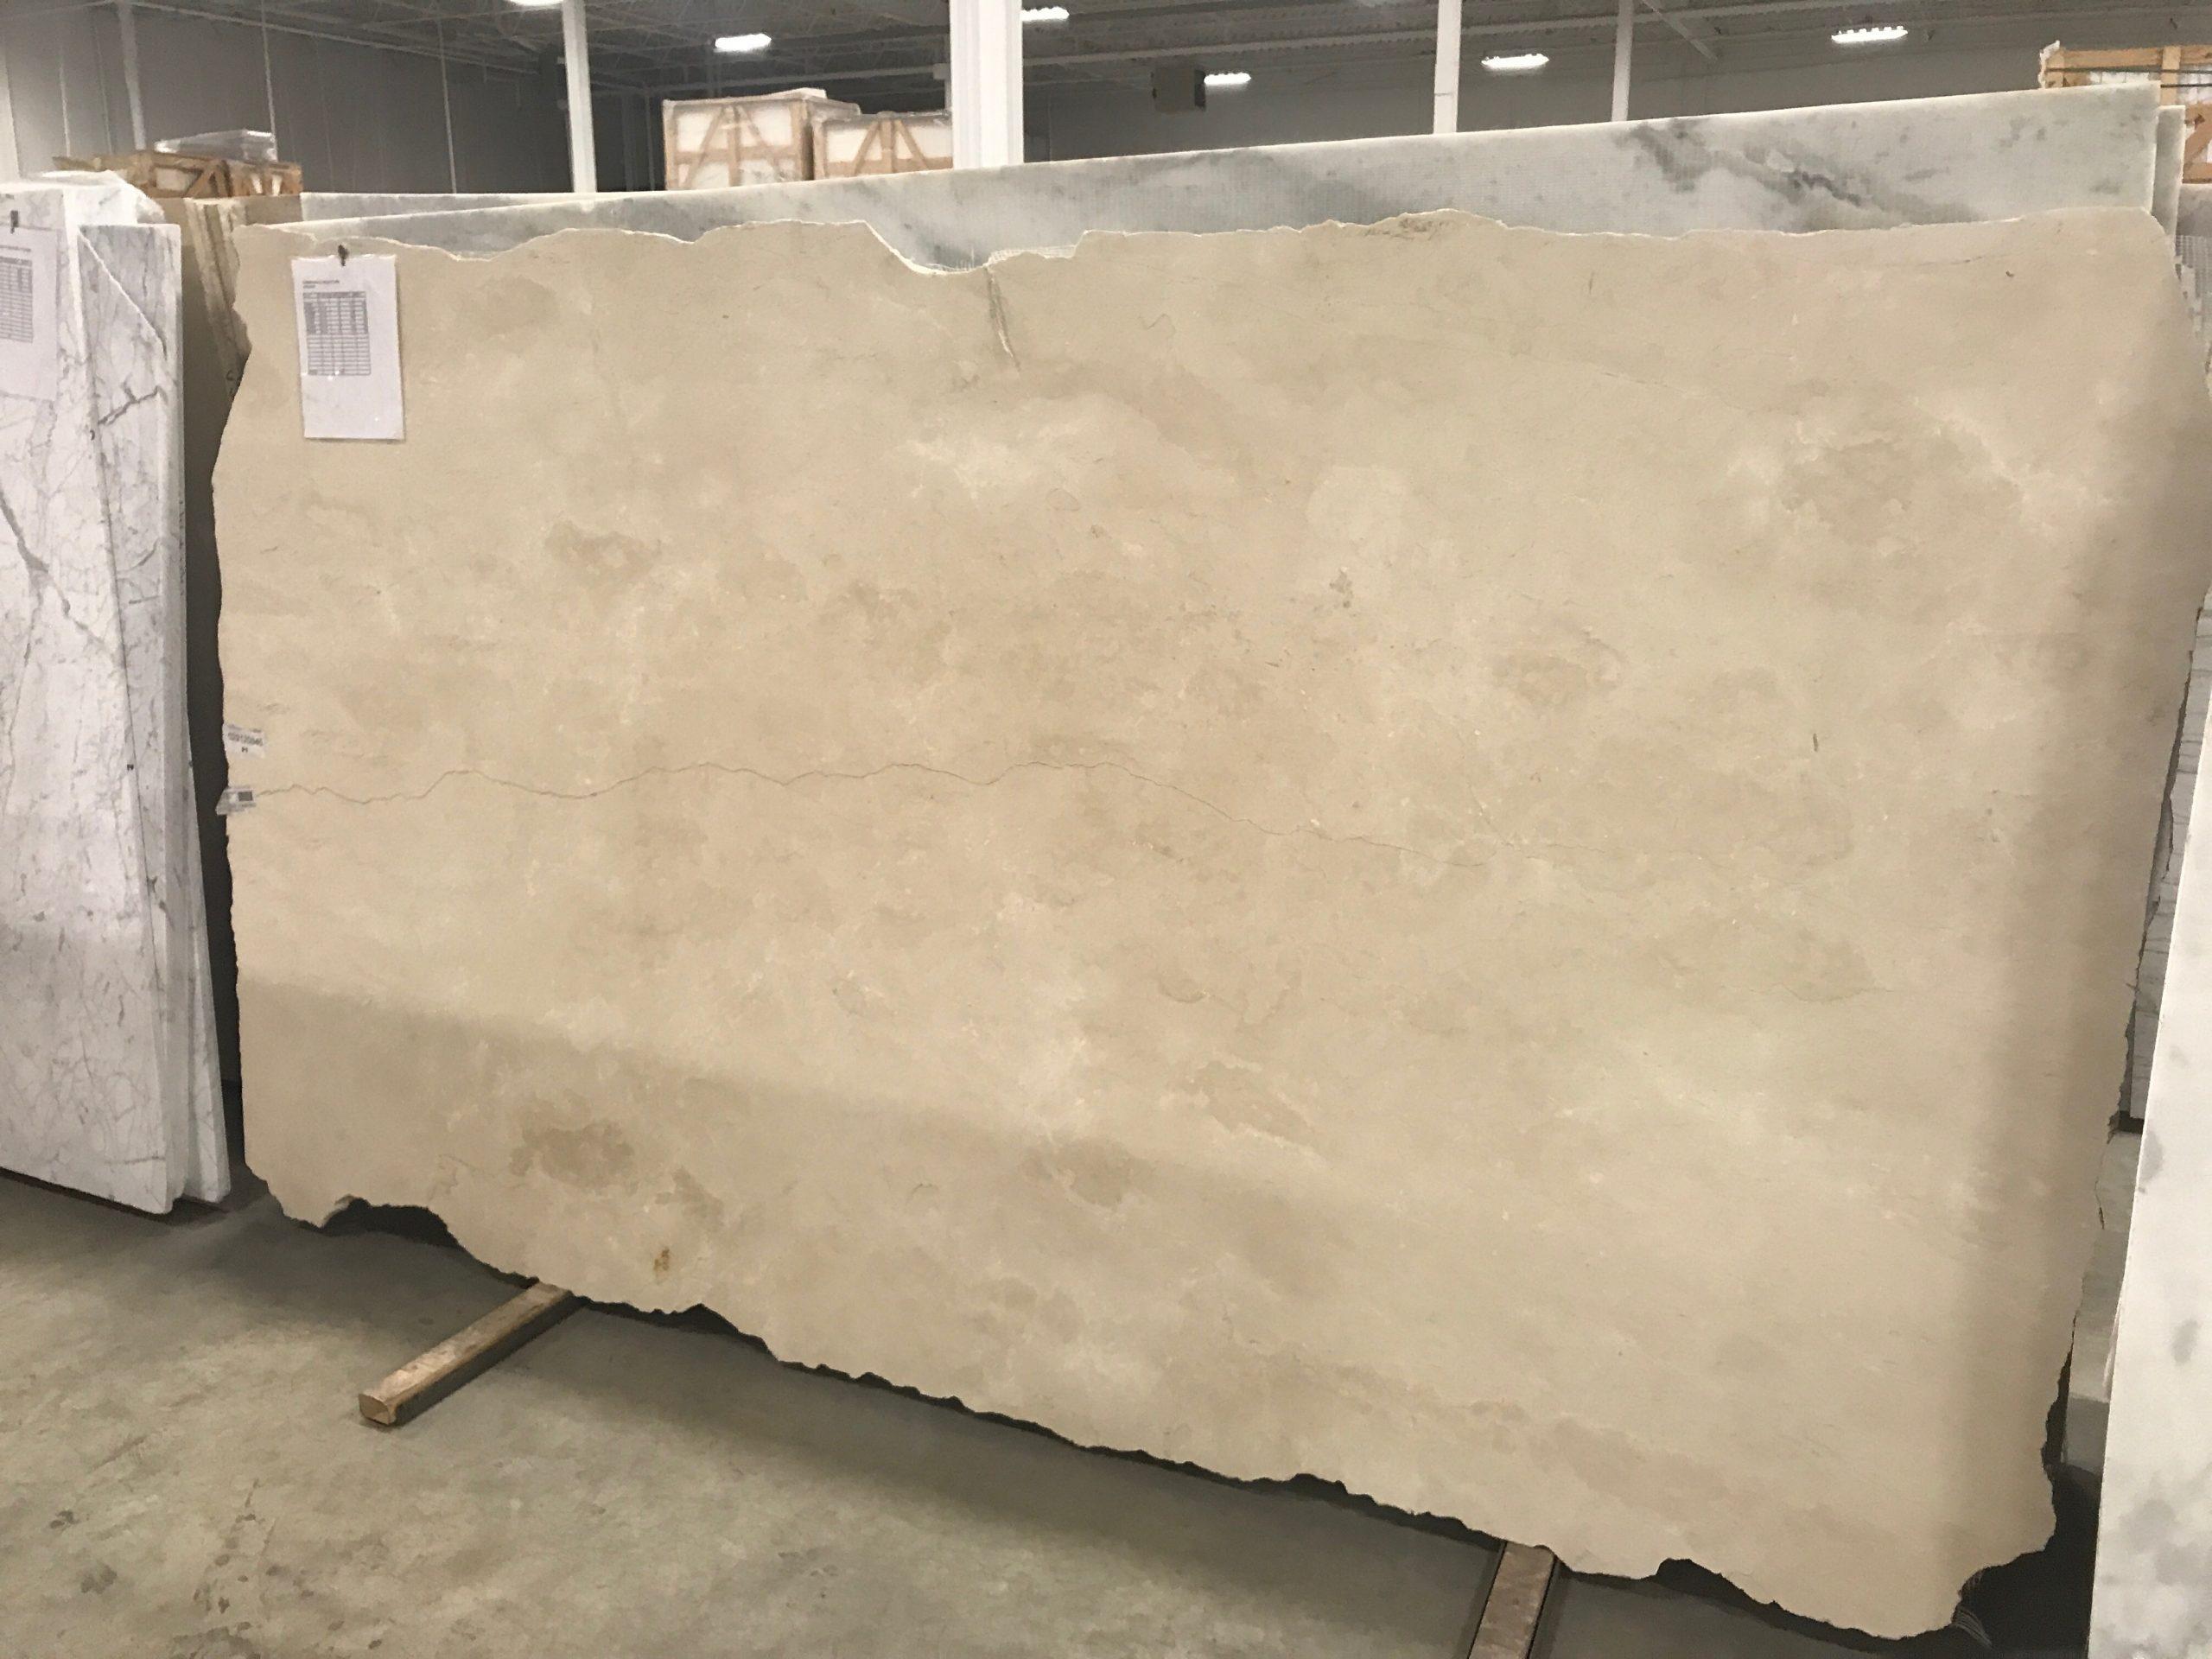 Crema Marfil Slabs Marble Trend Marble Granite Tiles